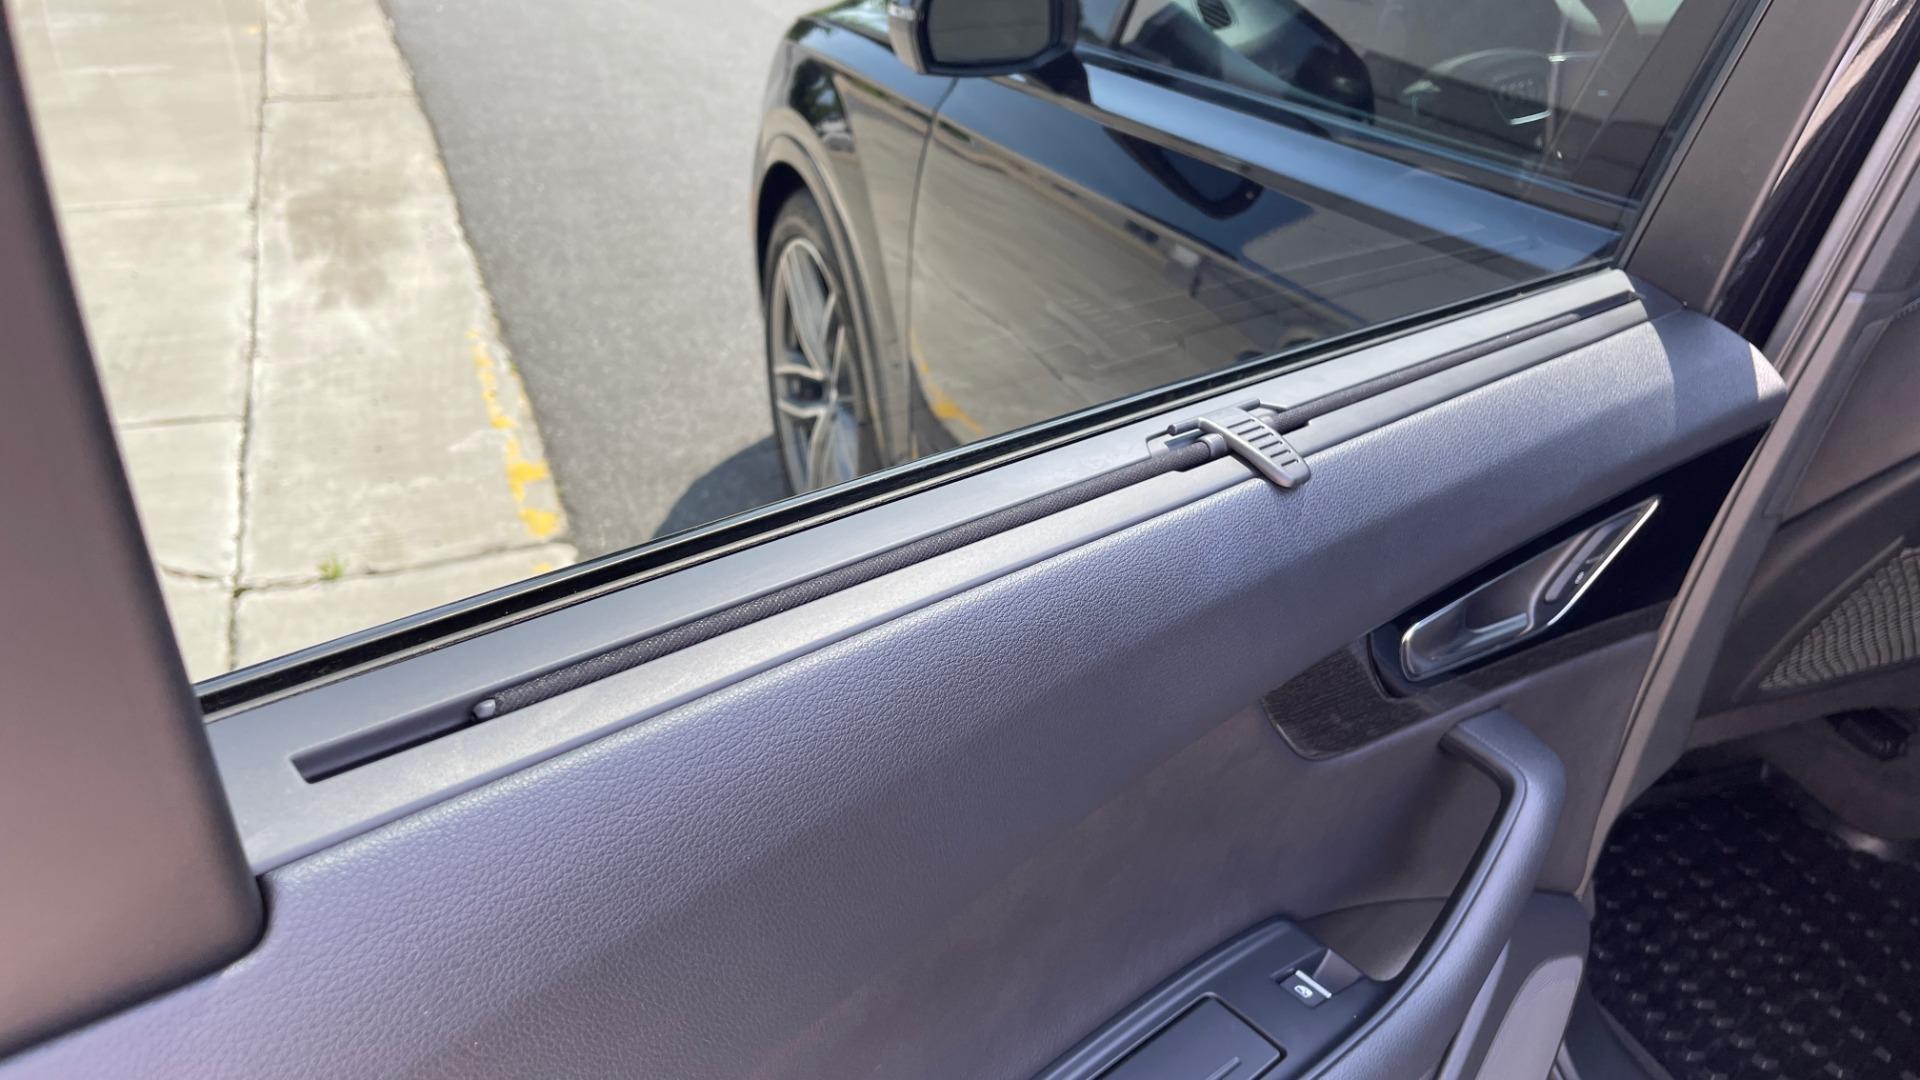 Used 2018 Audi Q7 PRESTIGE TIPTRONIC / NAV / SUNROOF / ADAPTIVE PKG / DRVR ASST / CLD WTHR /  for sale $49,995 at Formula Imports in Charlotte NC 28227 58